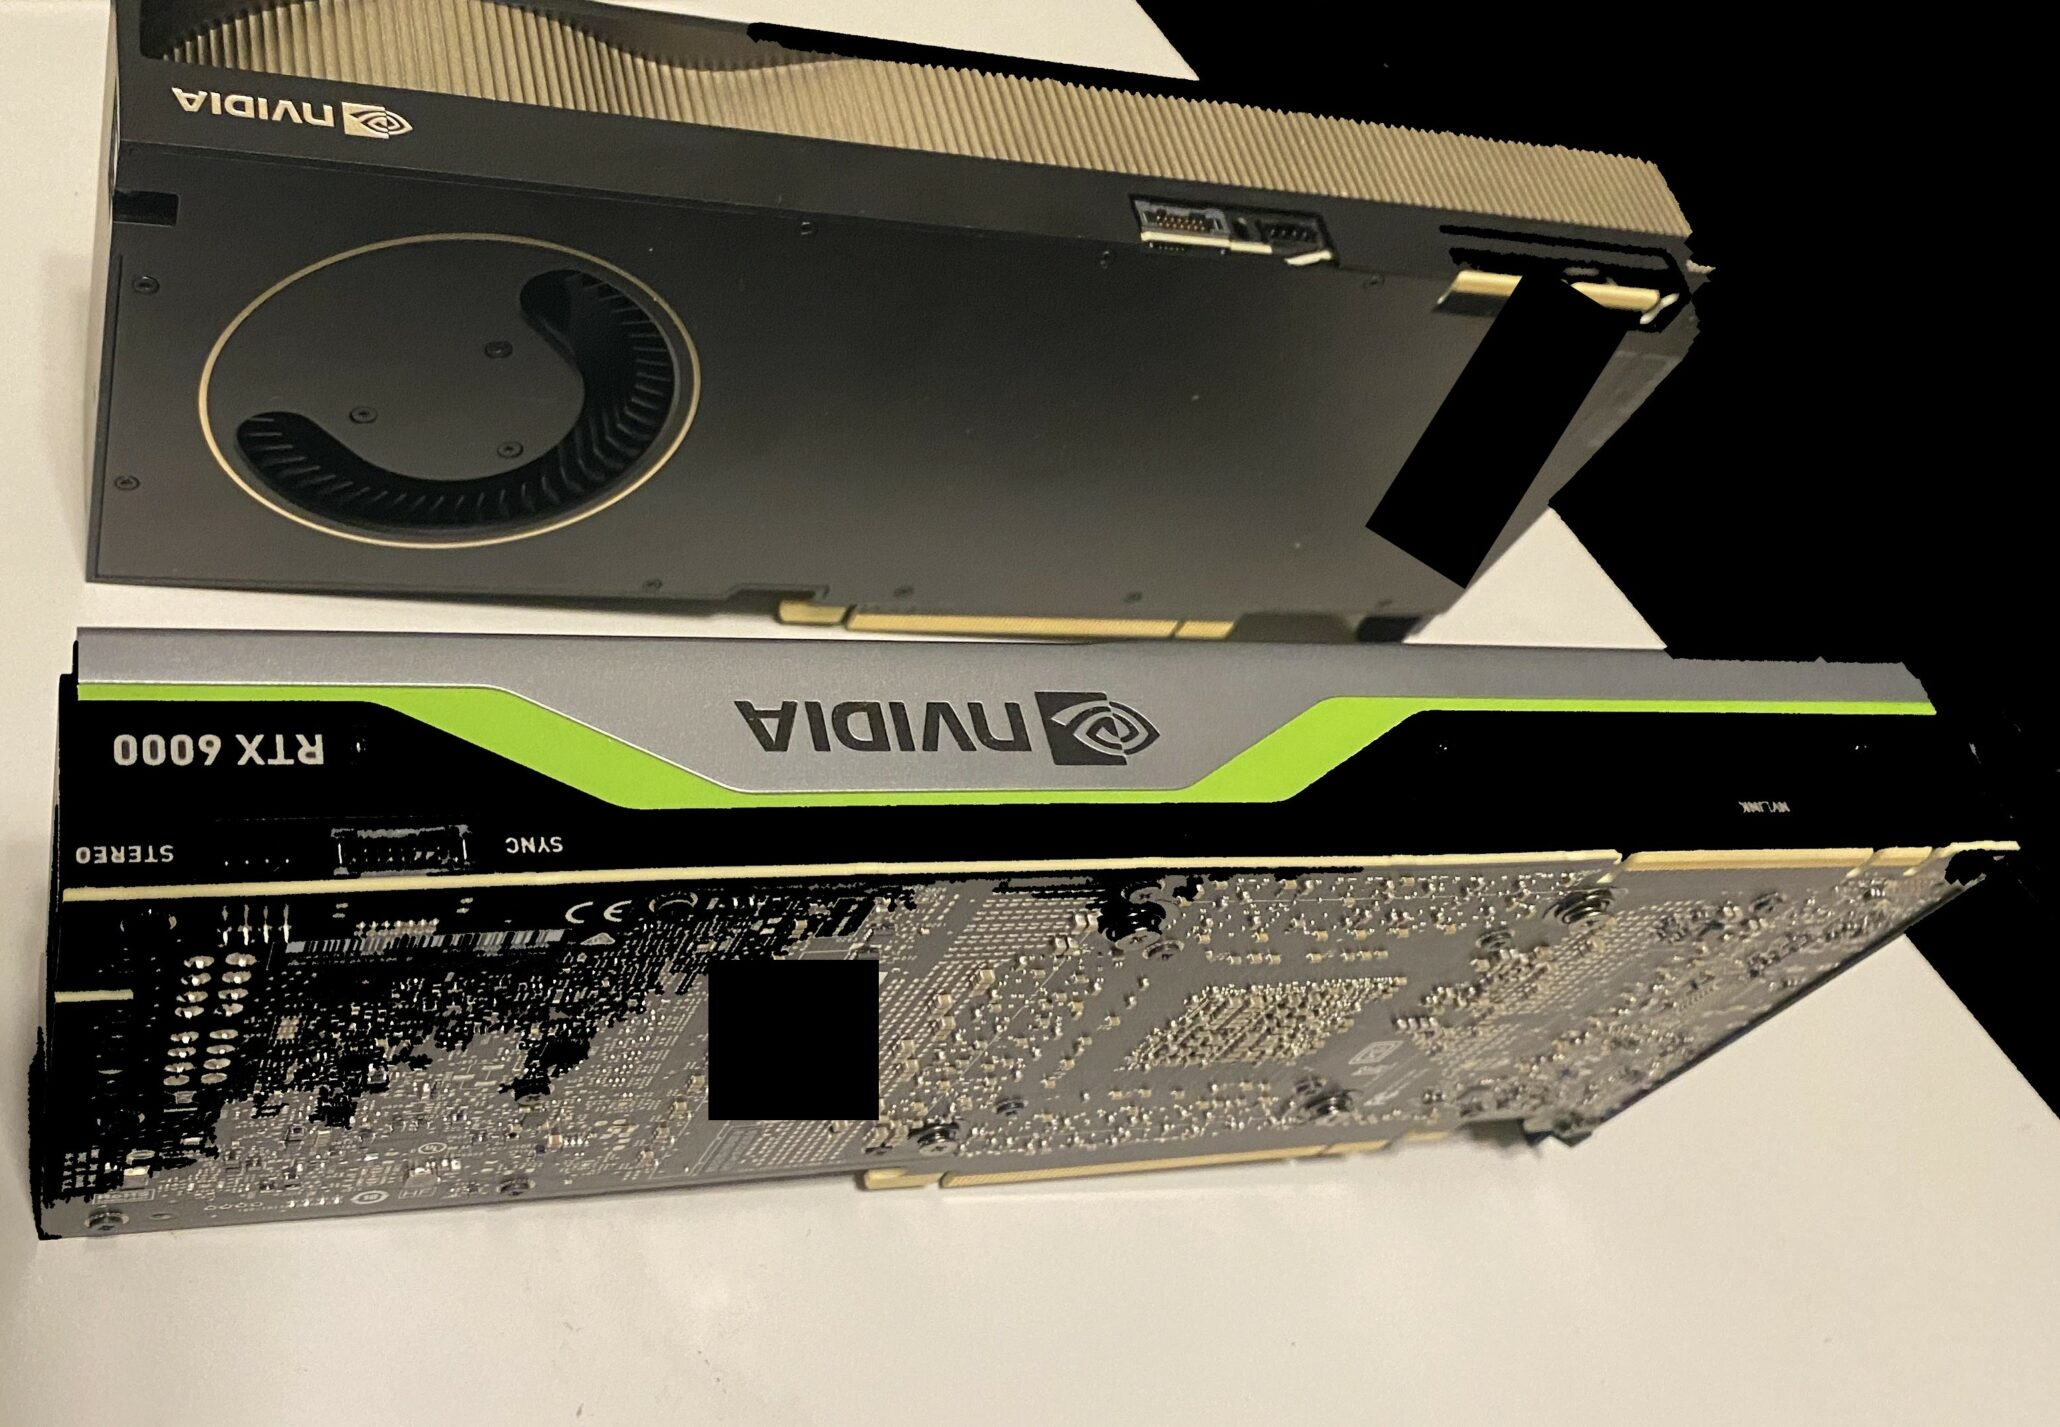 NVIDIA's Next-Gen Quadro RTX (Ampere) Graphics Card Gambar dan Detail